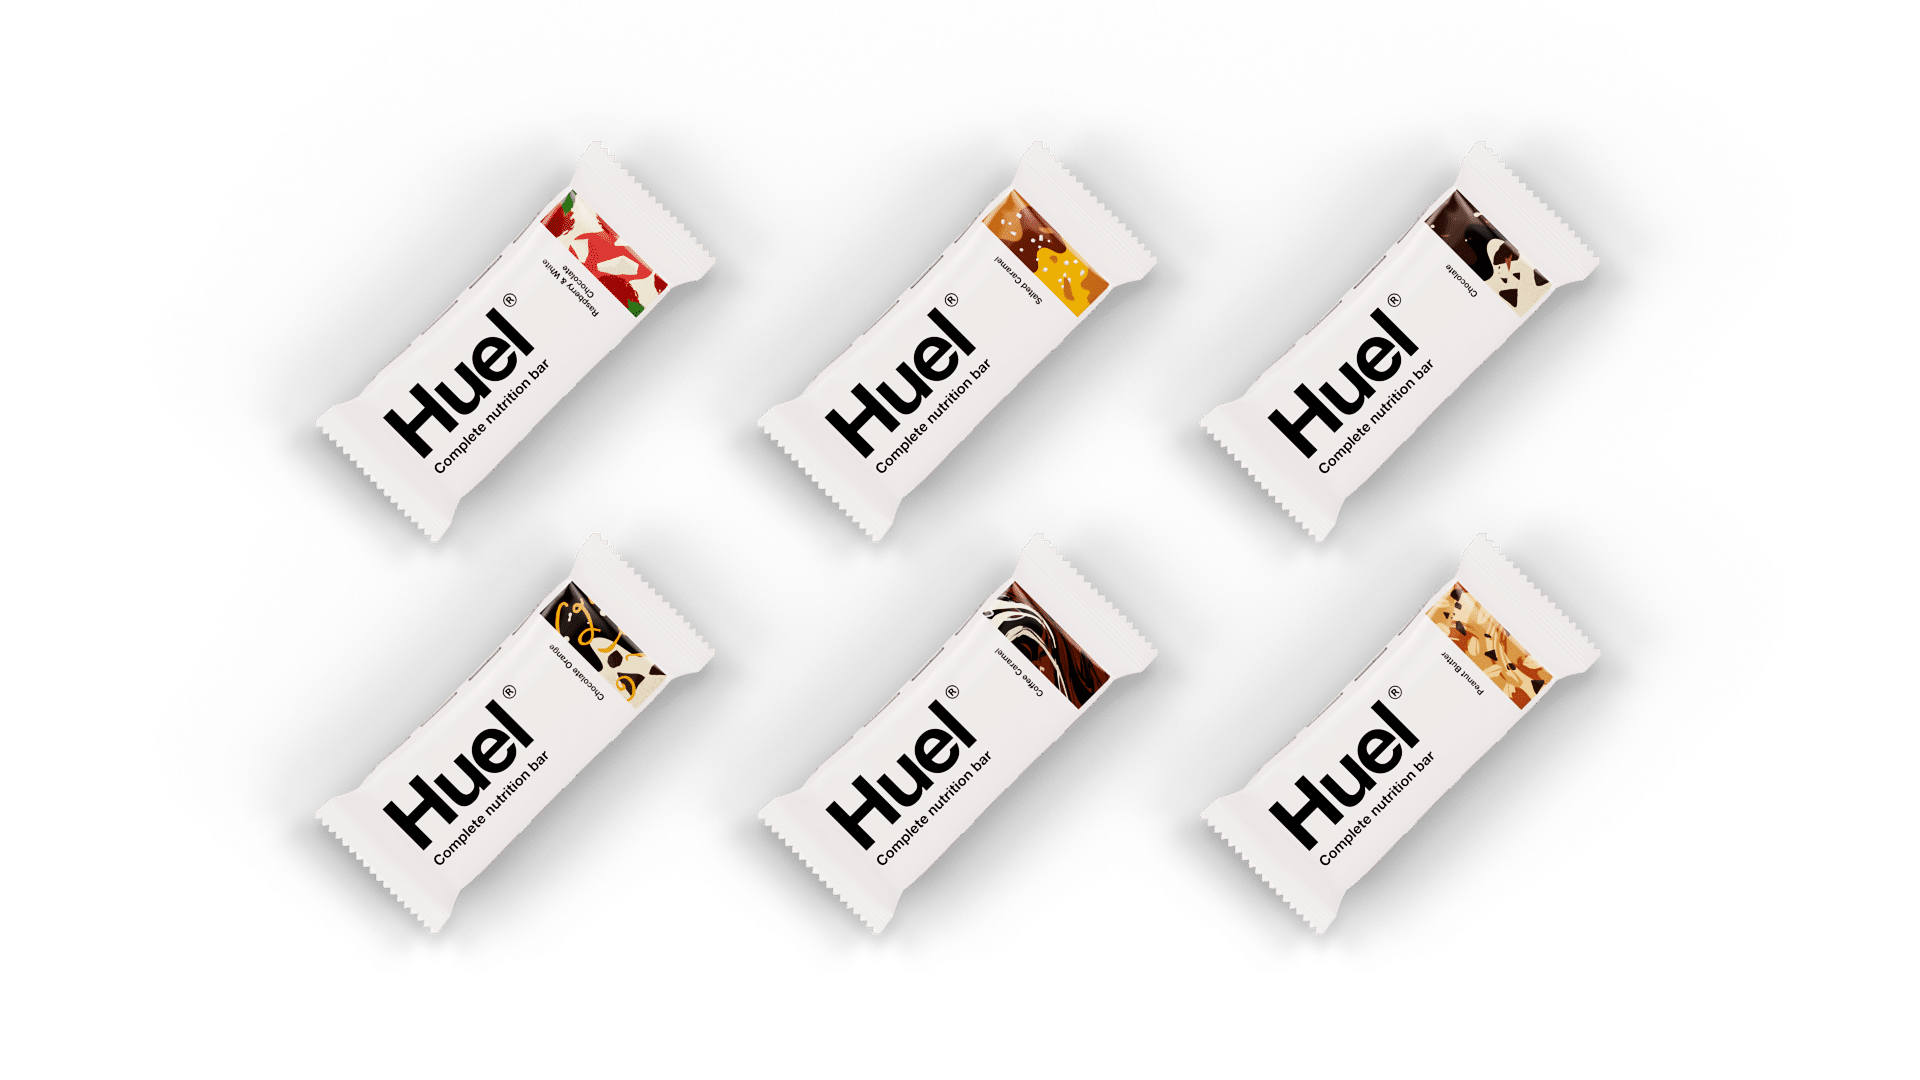 Huel Launches Vegan Raspberry & White Chocolate Snack Bar